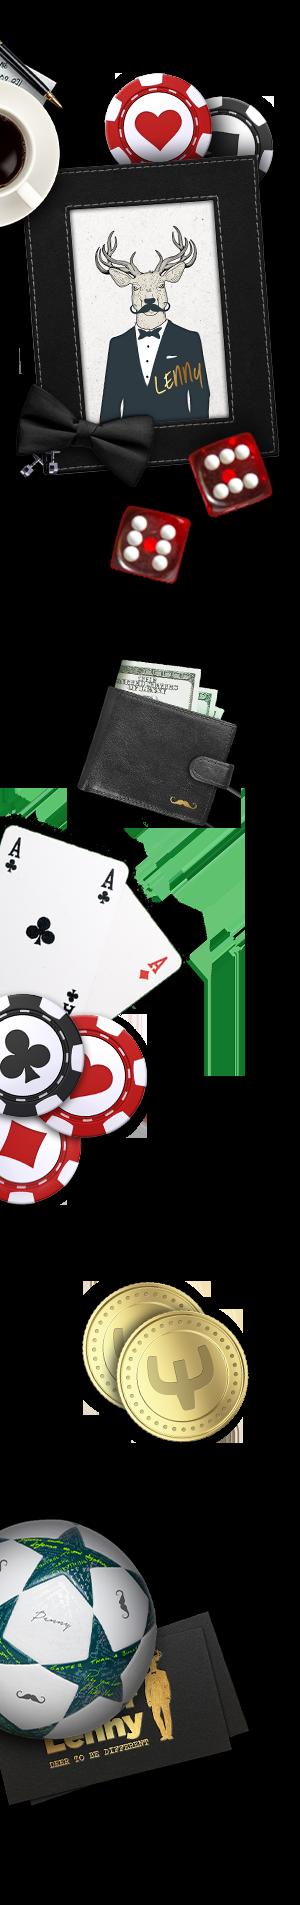 WebMoney в онлайн-казино